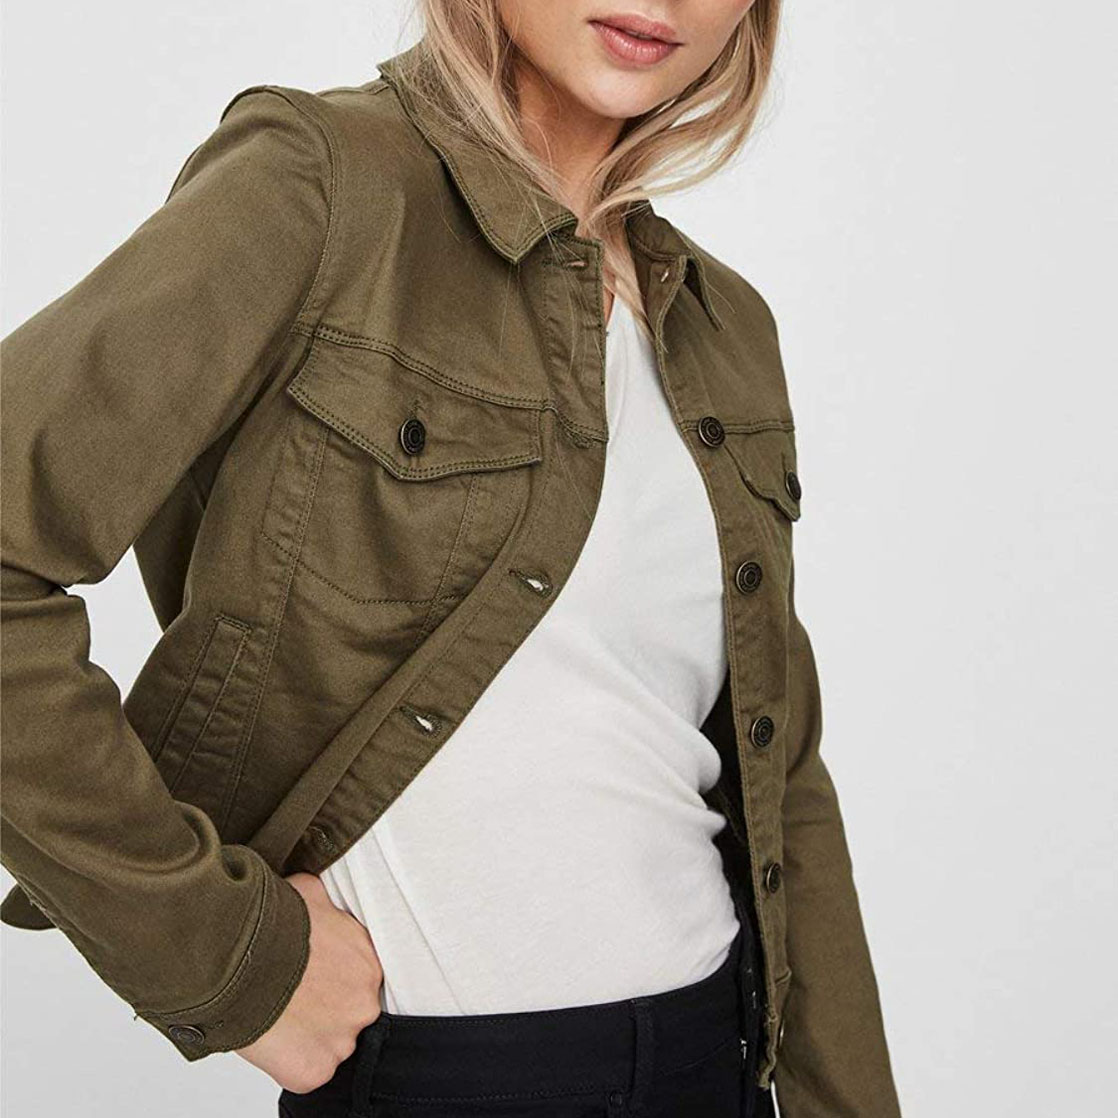 Olive Green Most Trendy Denim Jacket for women WJJ-16